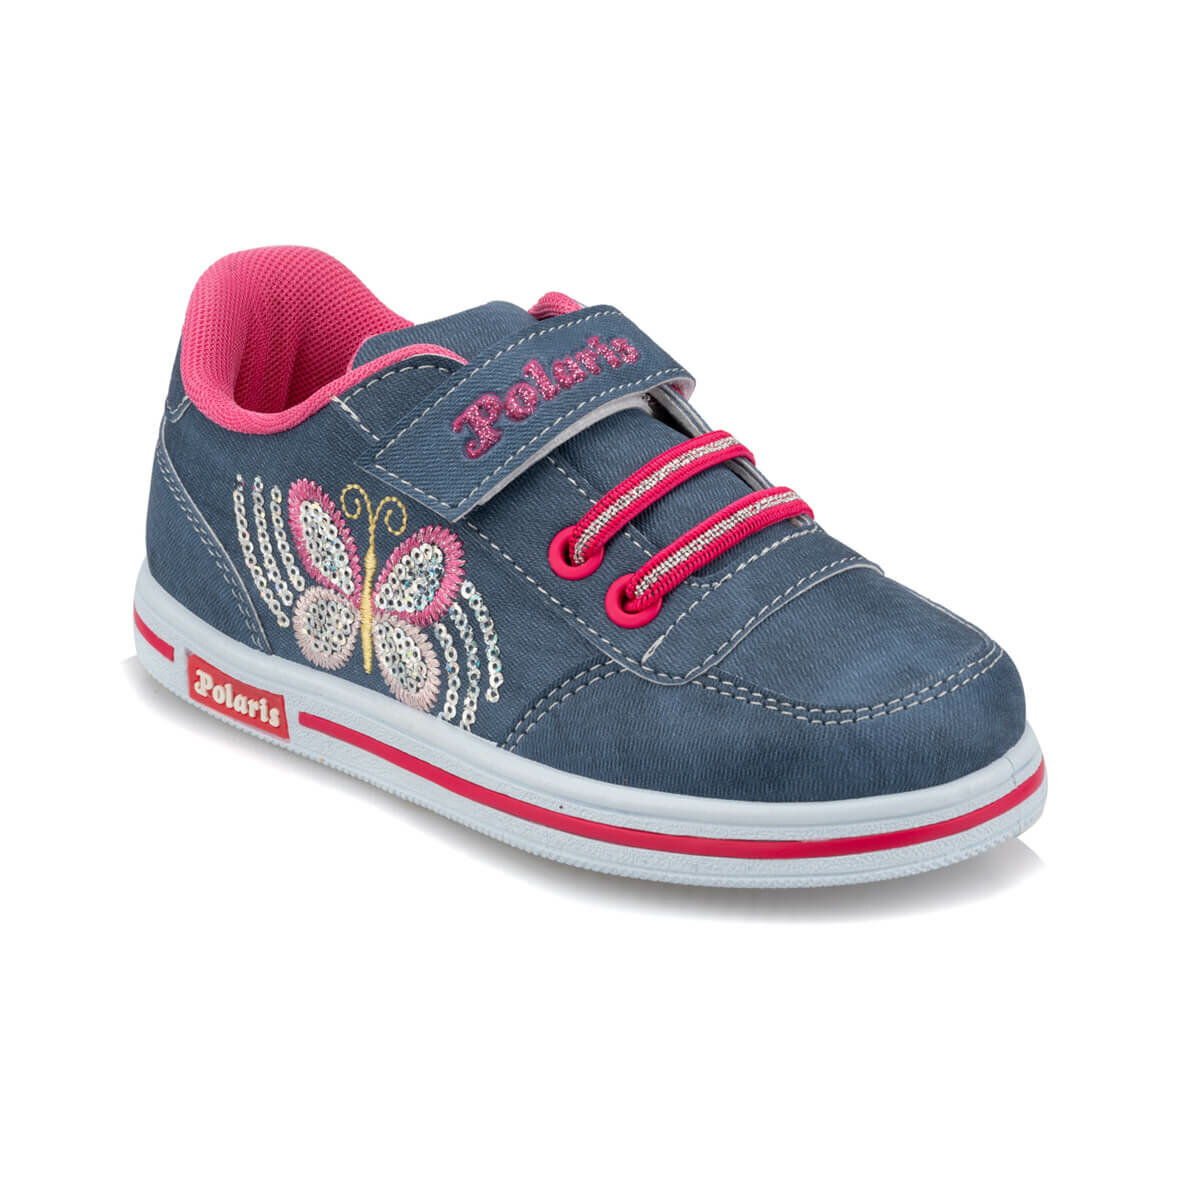 FLO 92.509799.P Navy Blue Female Child Sneaker Shoes Polaris